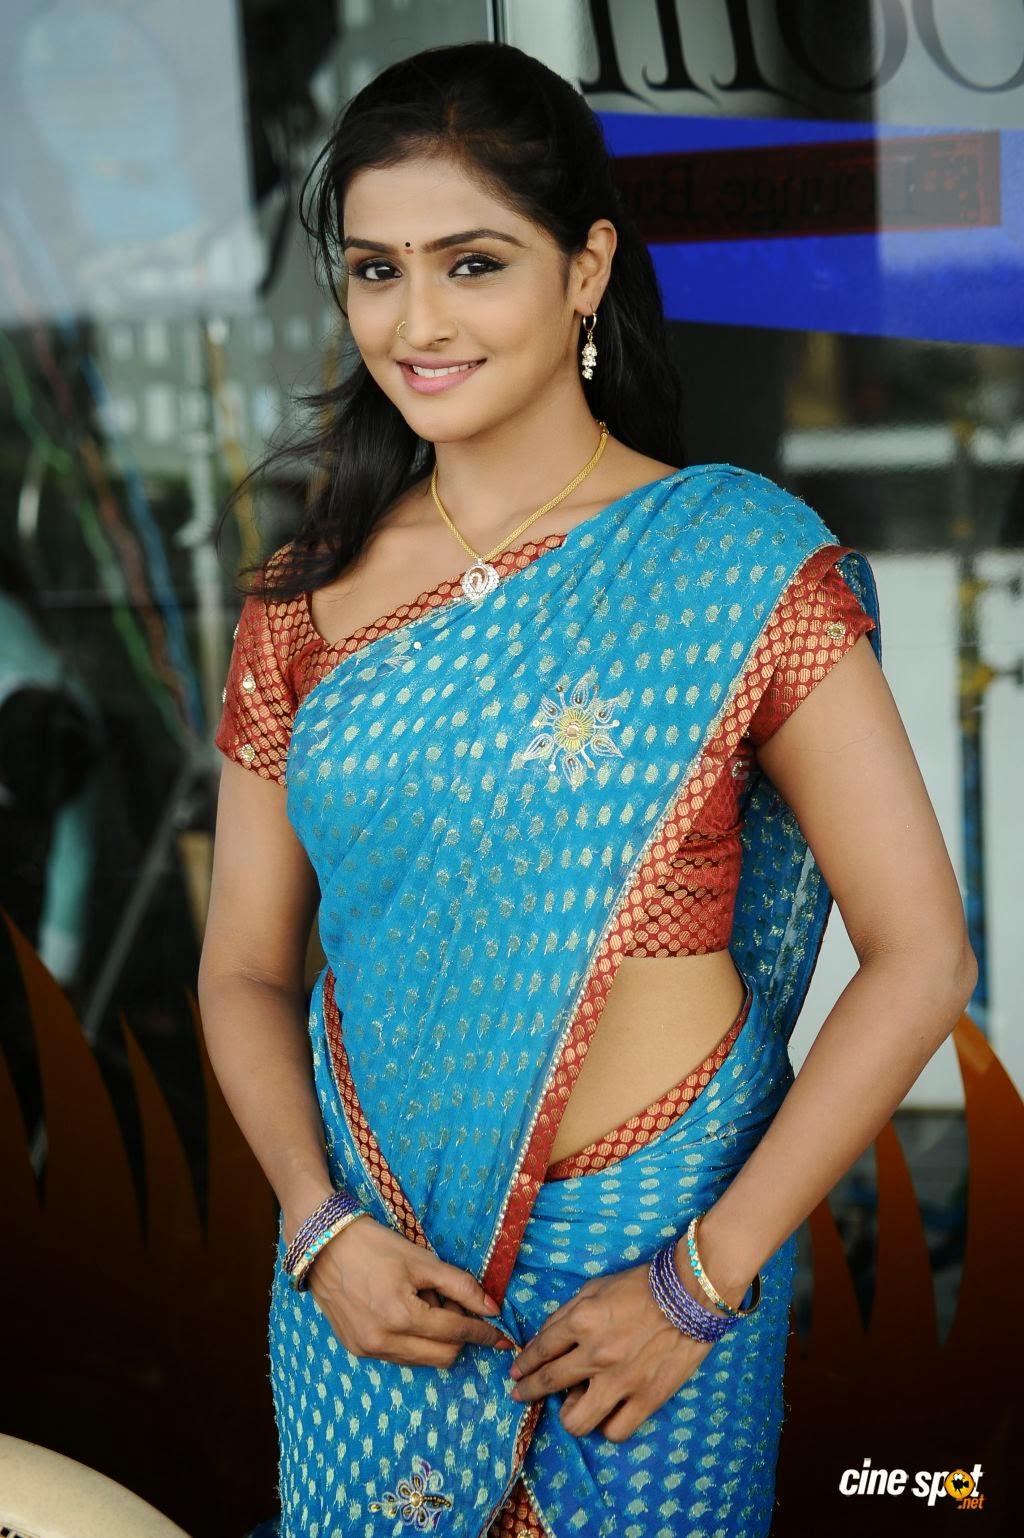 Beautiful Indian Actresses Gallery Remya Nambeesan -2644